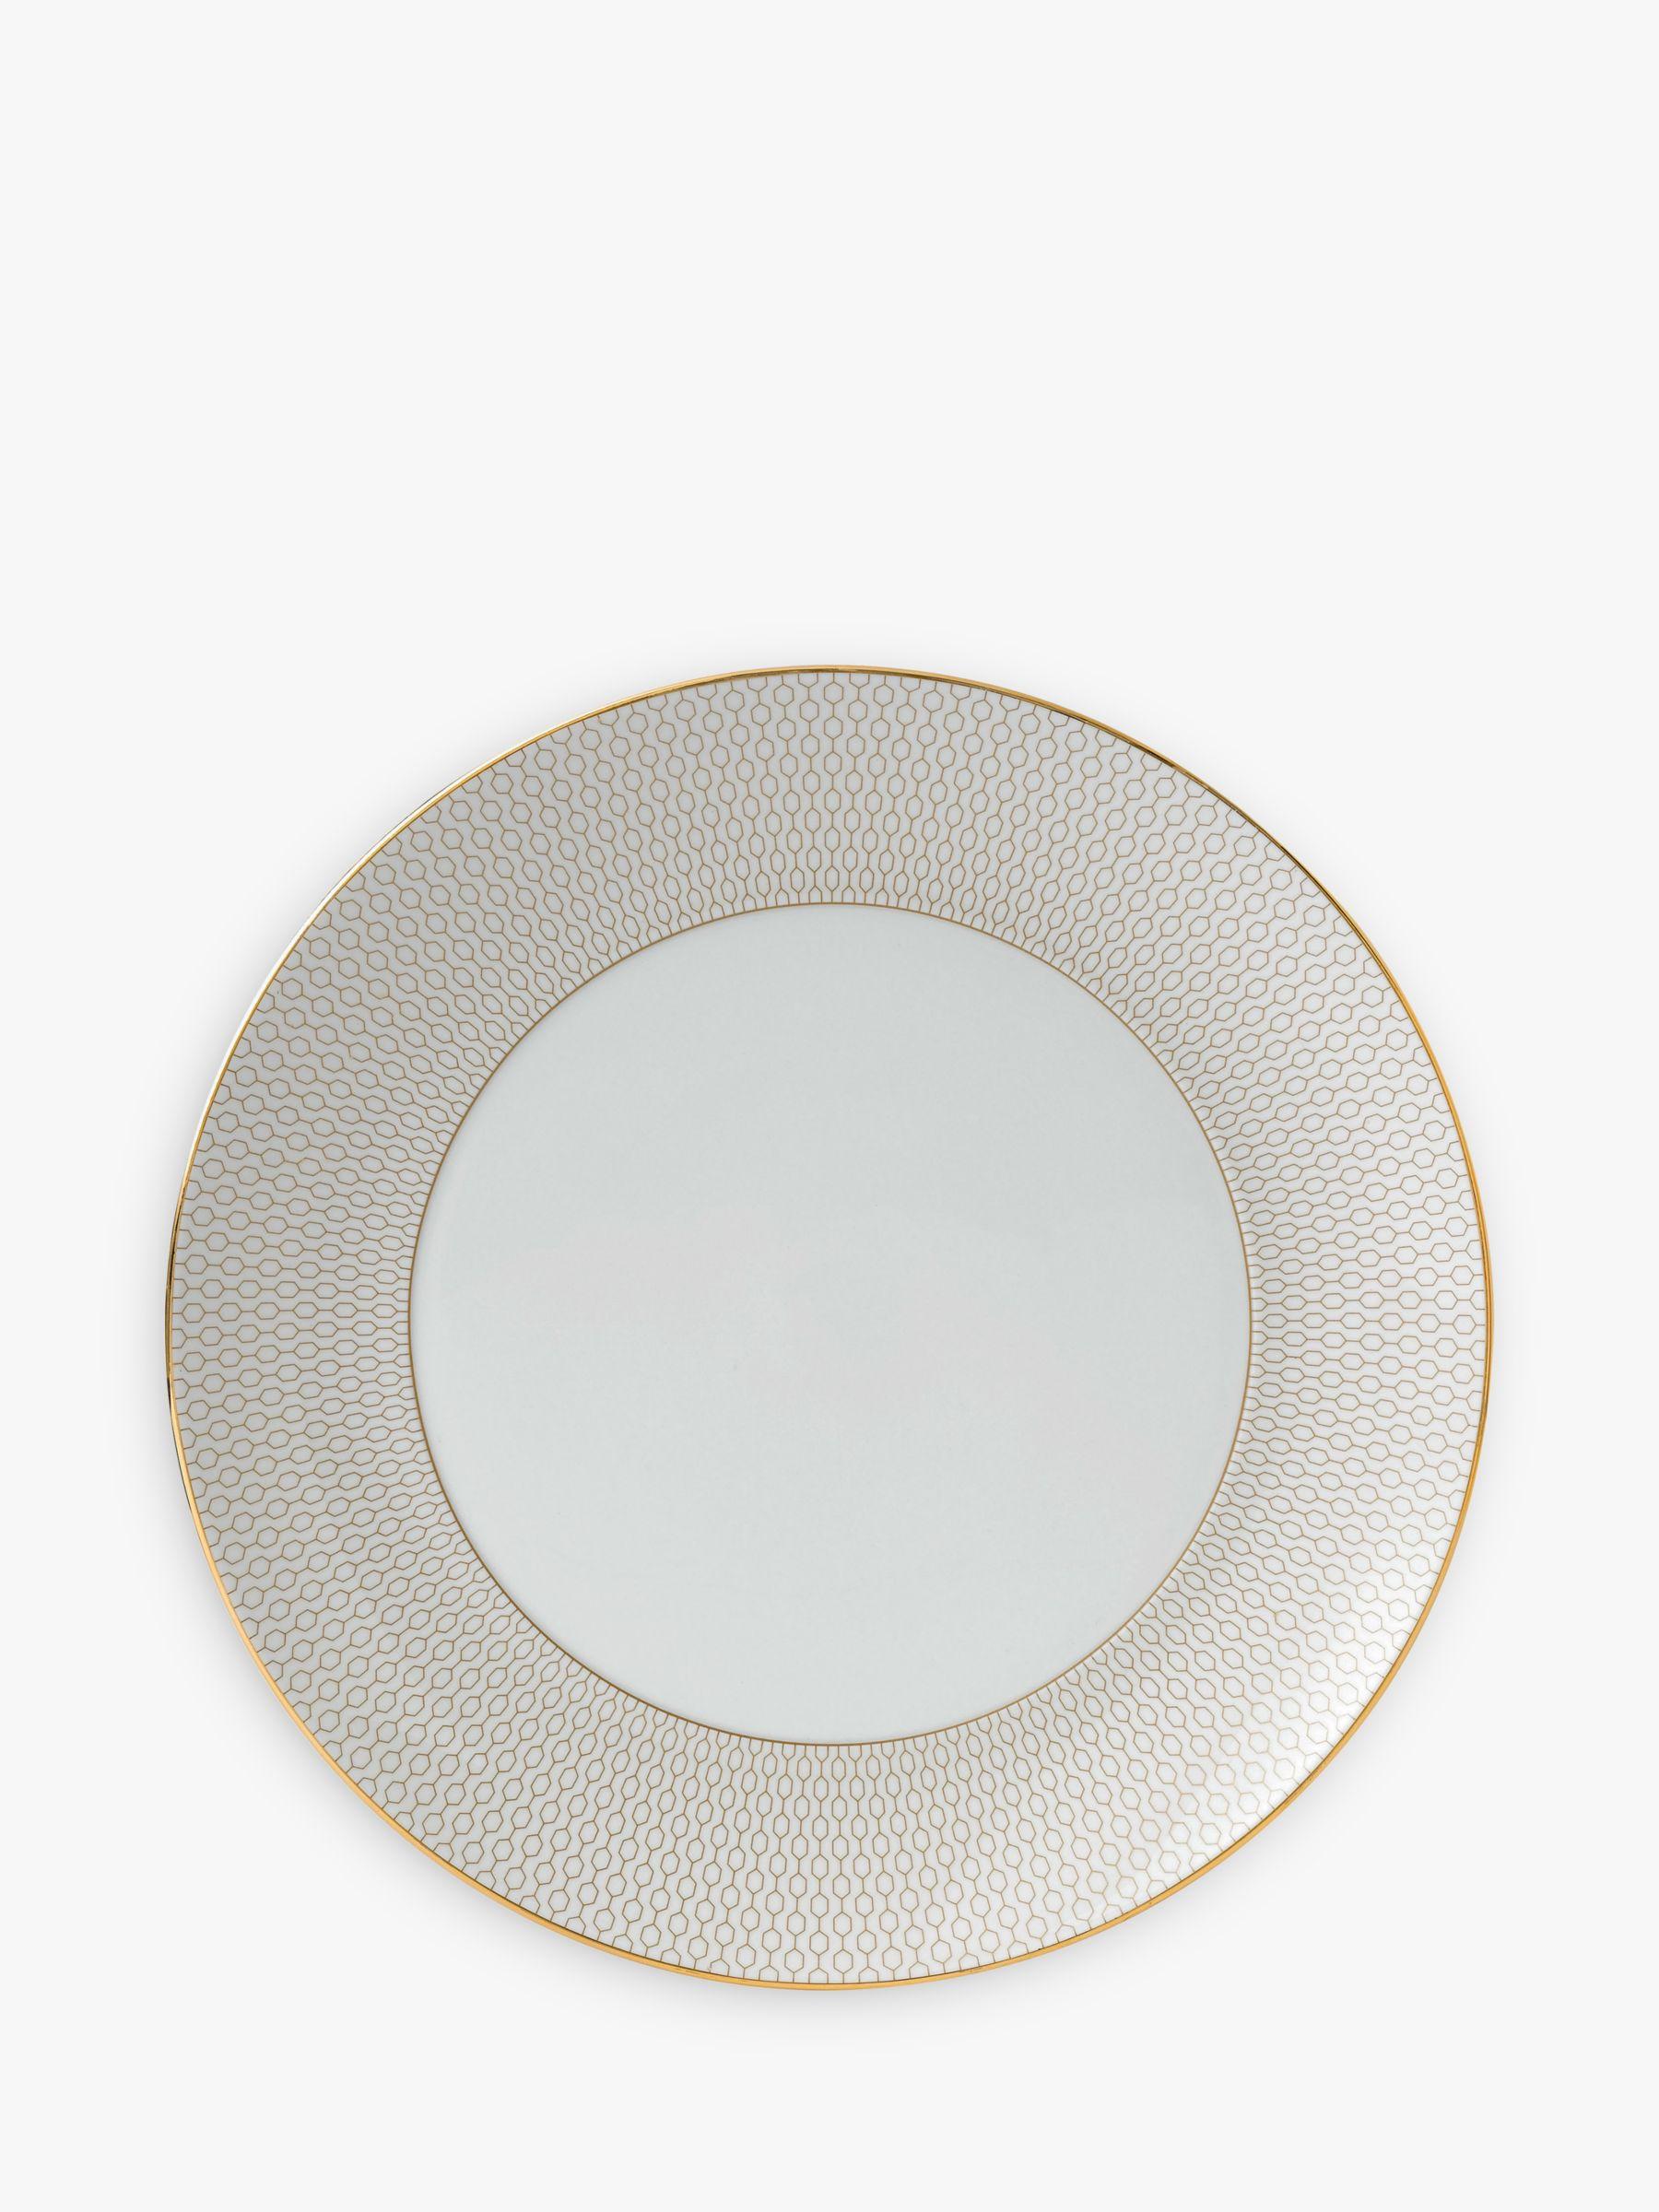 Wedgwood Wedgwood Arris Dinner Plate, 28cm, Gold/White